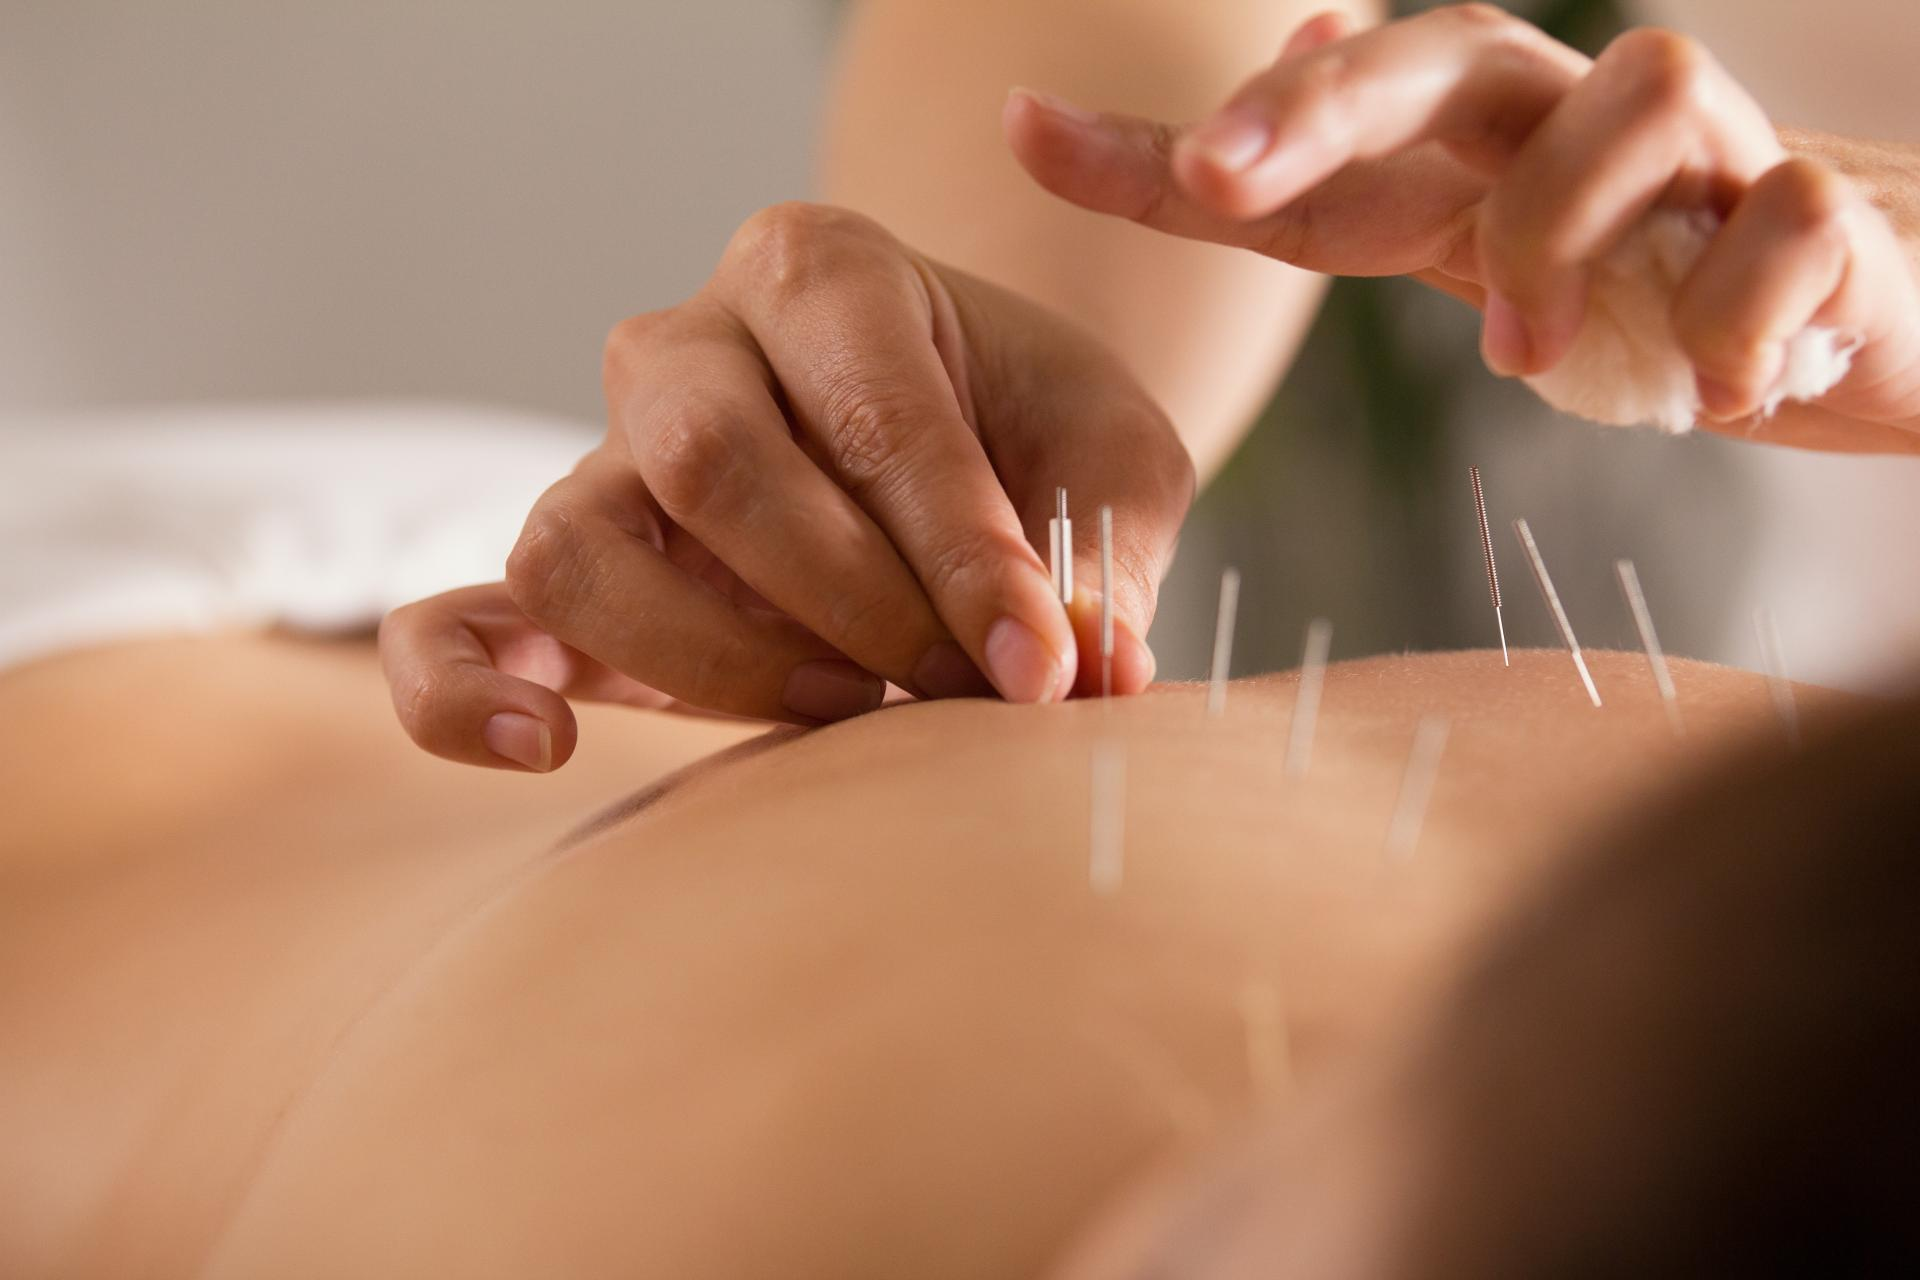 Tipos de terapias alternativas en Mallorca ofrecidas por el centro Kikai Acupuntura Mallorca